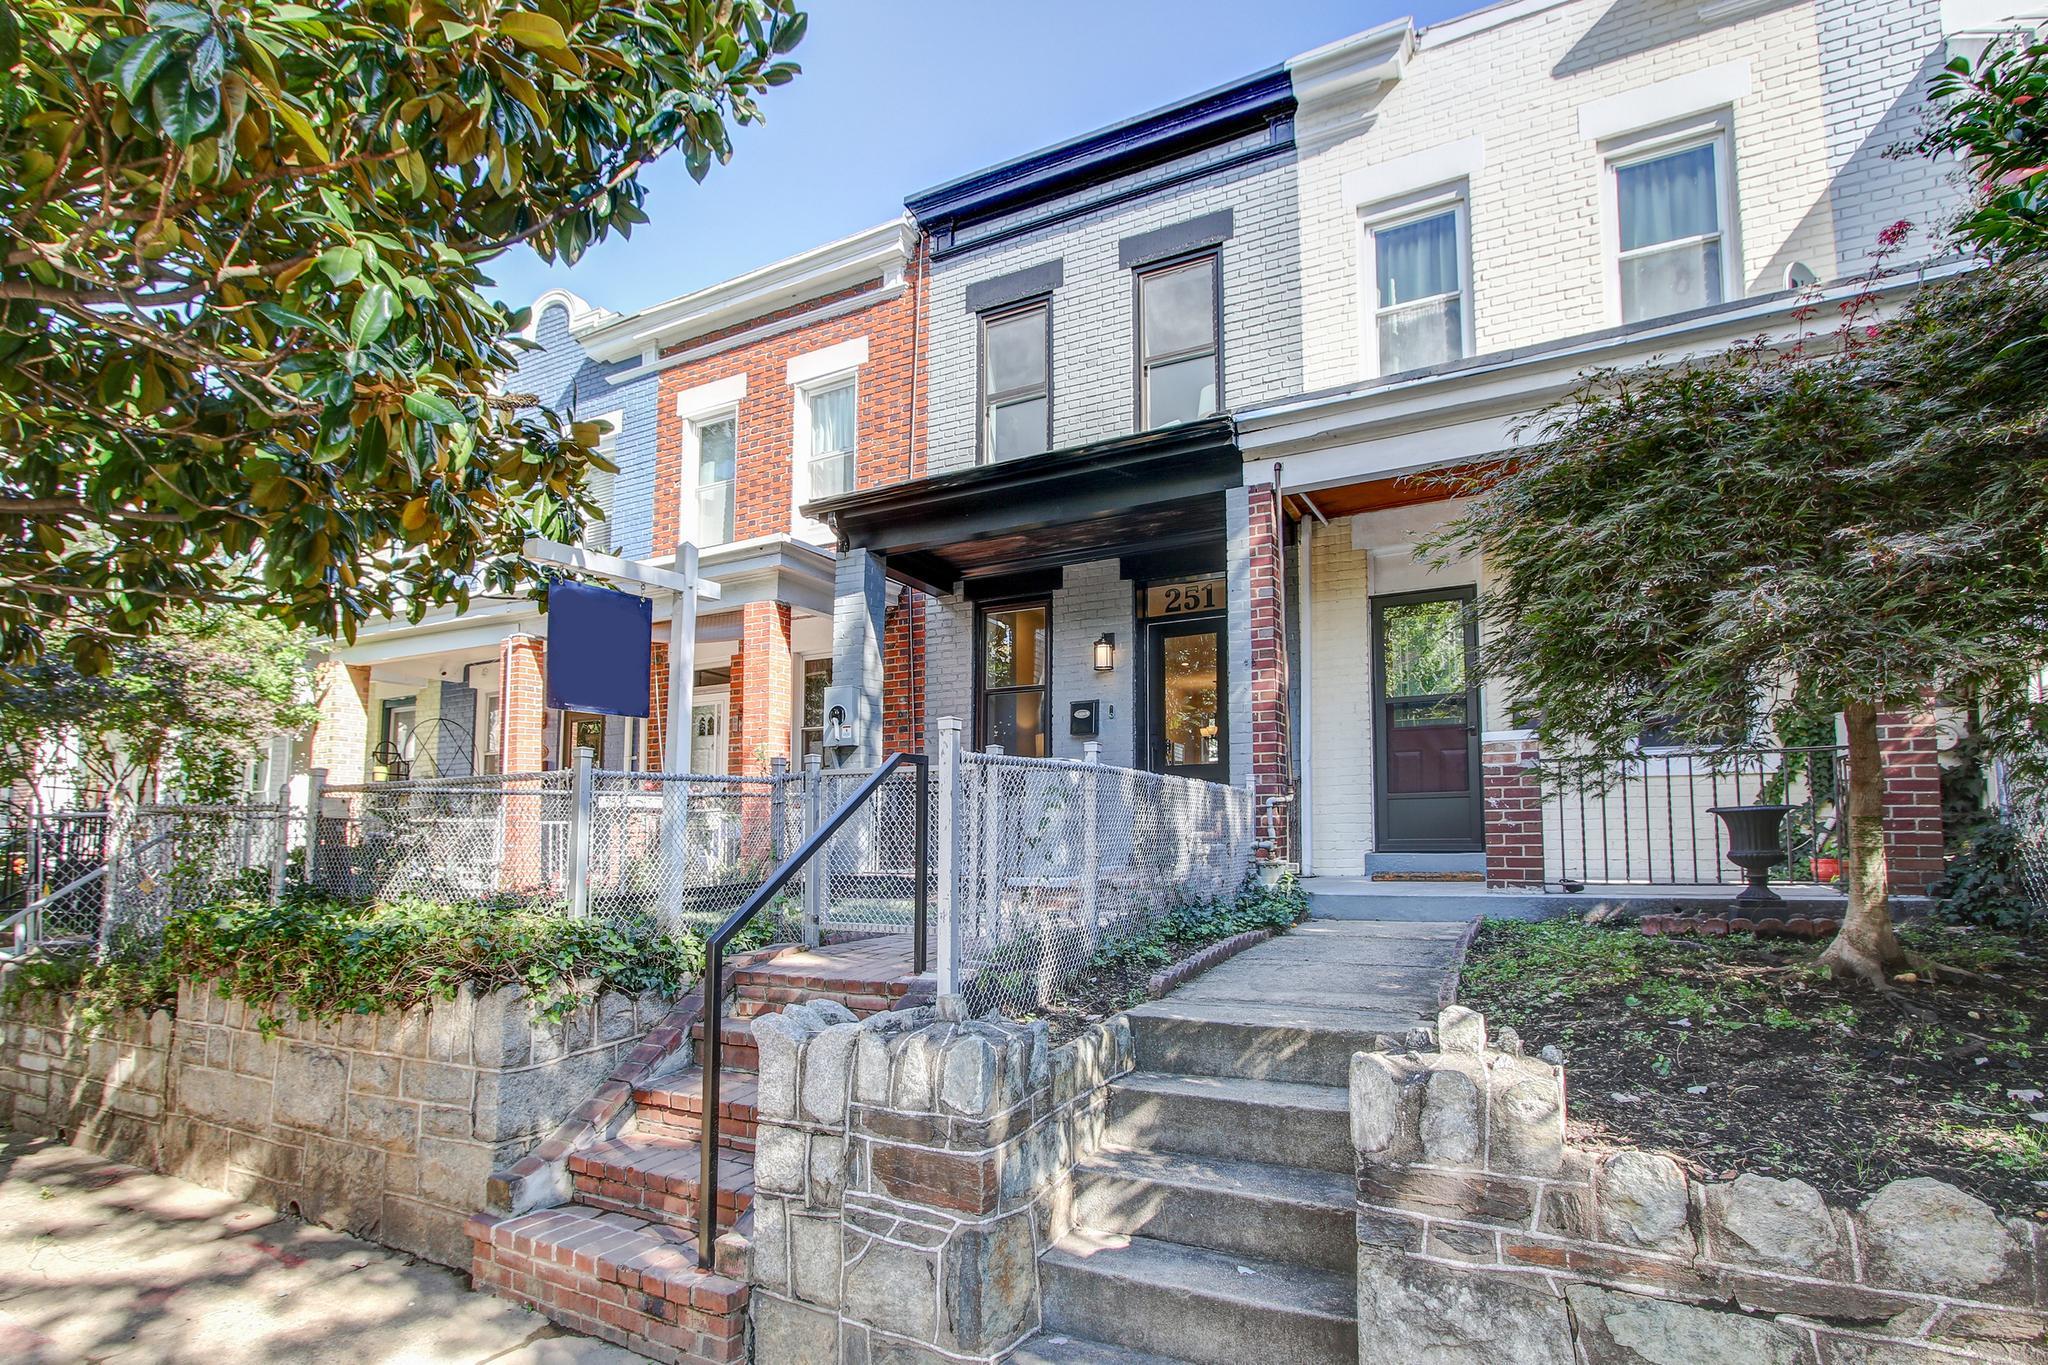 Property for Sale at 251 14th Pl NE 251 14th Pl NE Washington, District Of Columbia 20002 United States